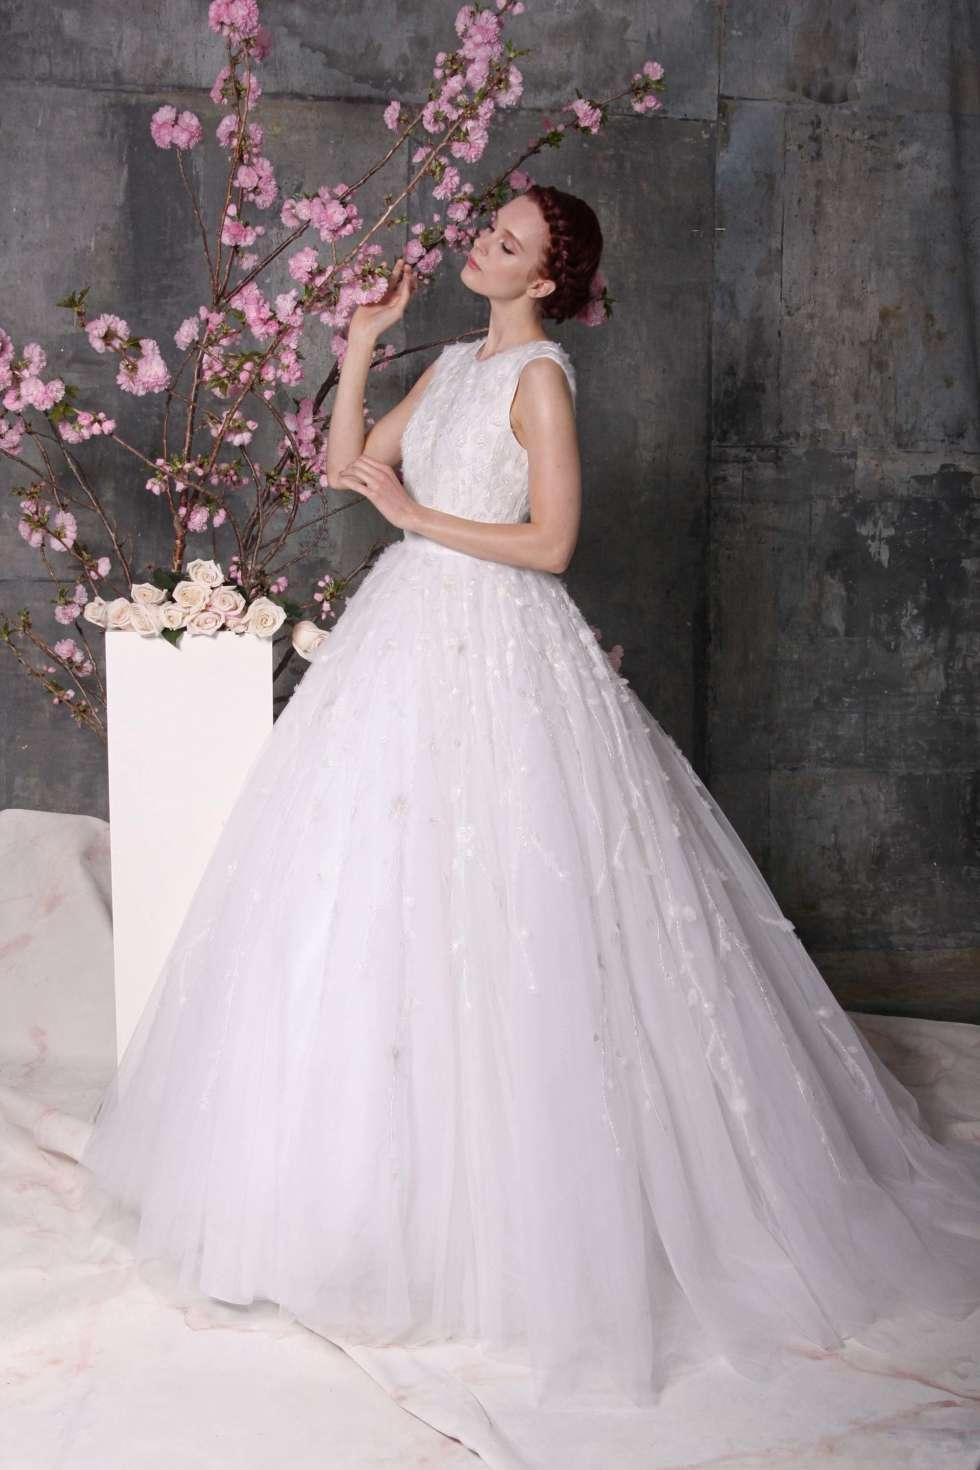 Christian Siriano Wedding Dresses 6 Superb Spring Bridal Collection Christian